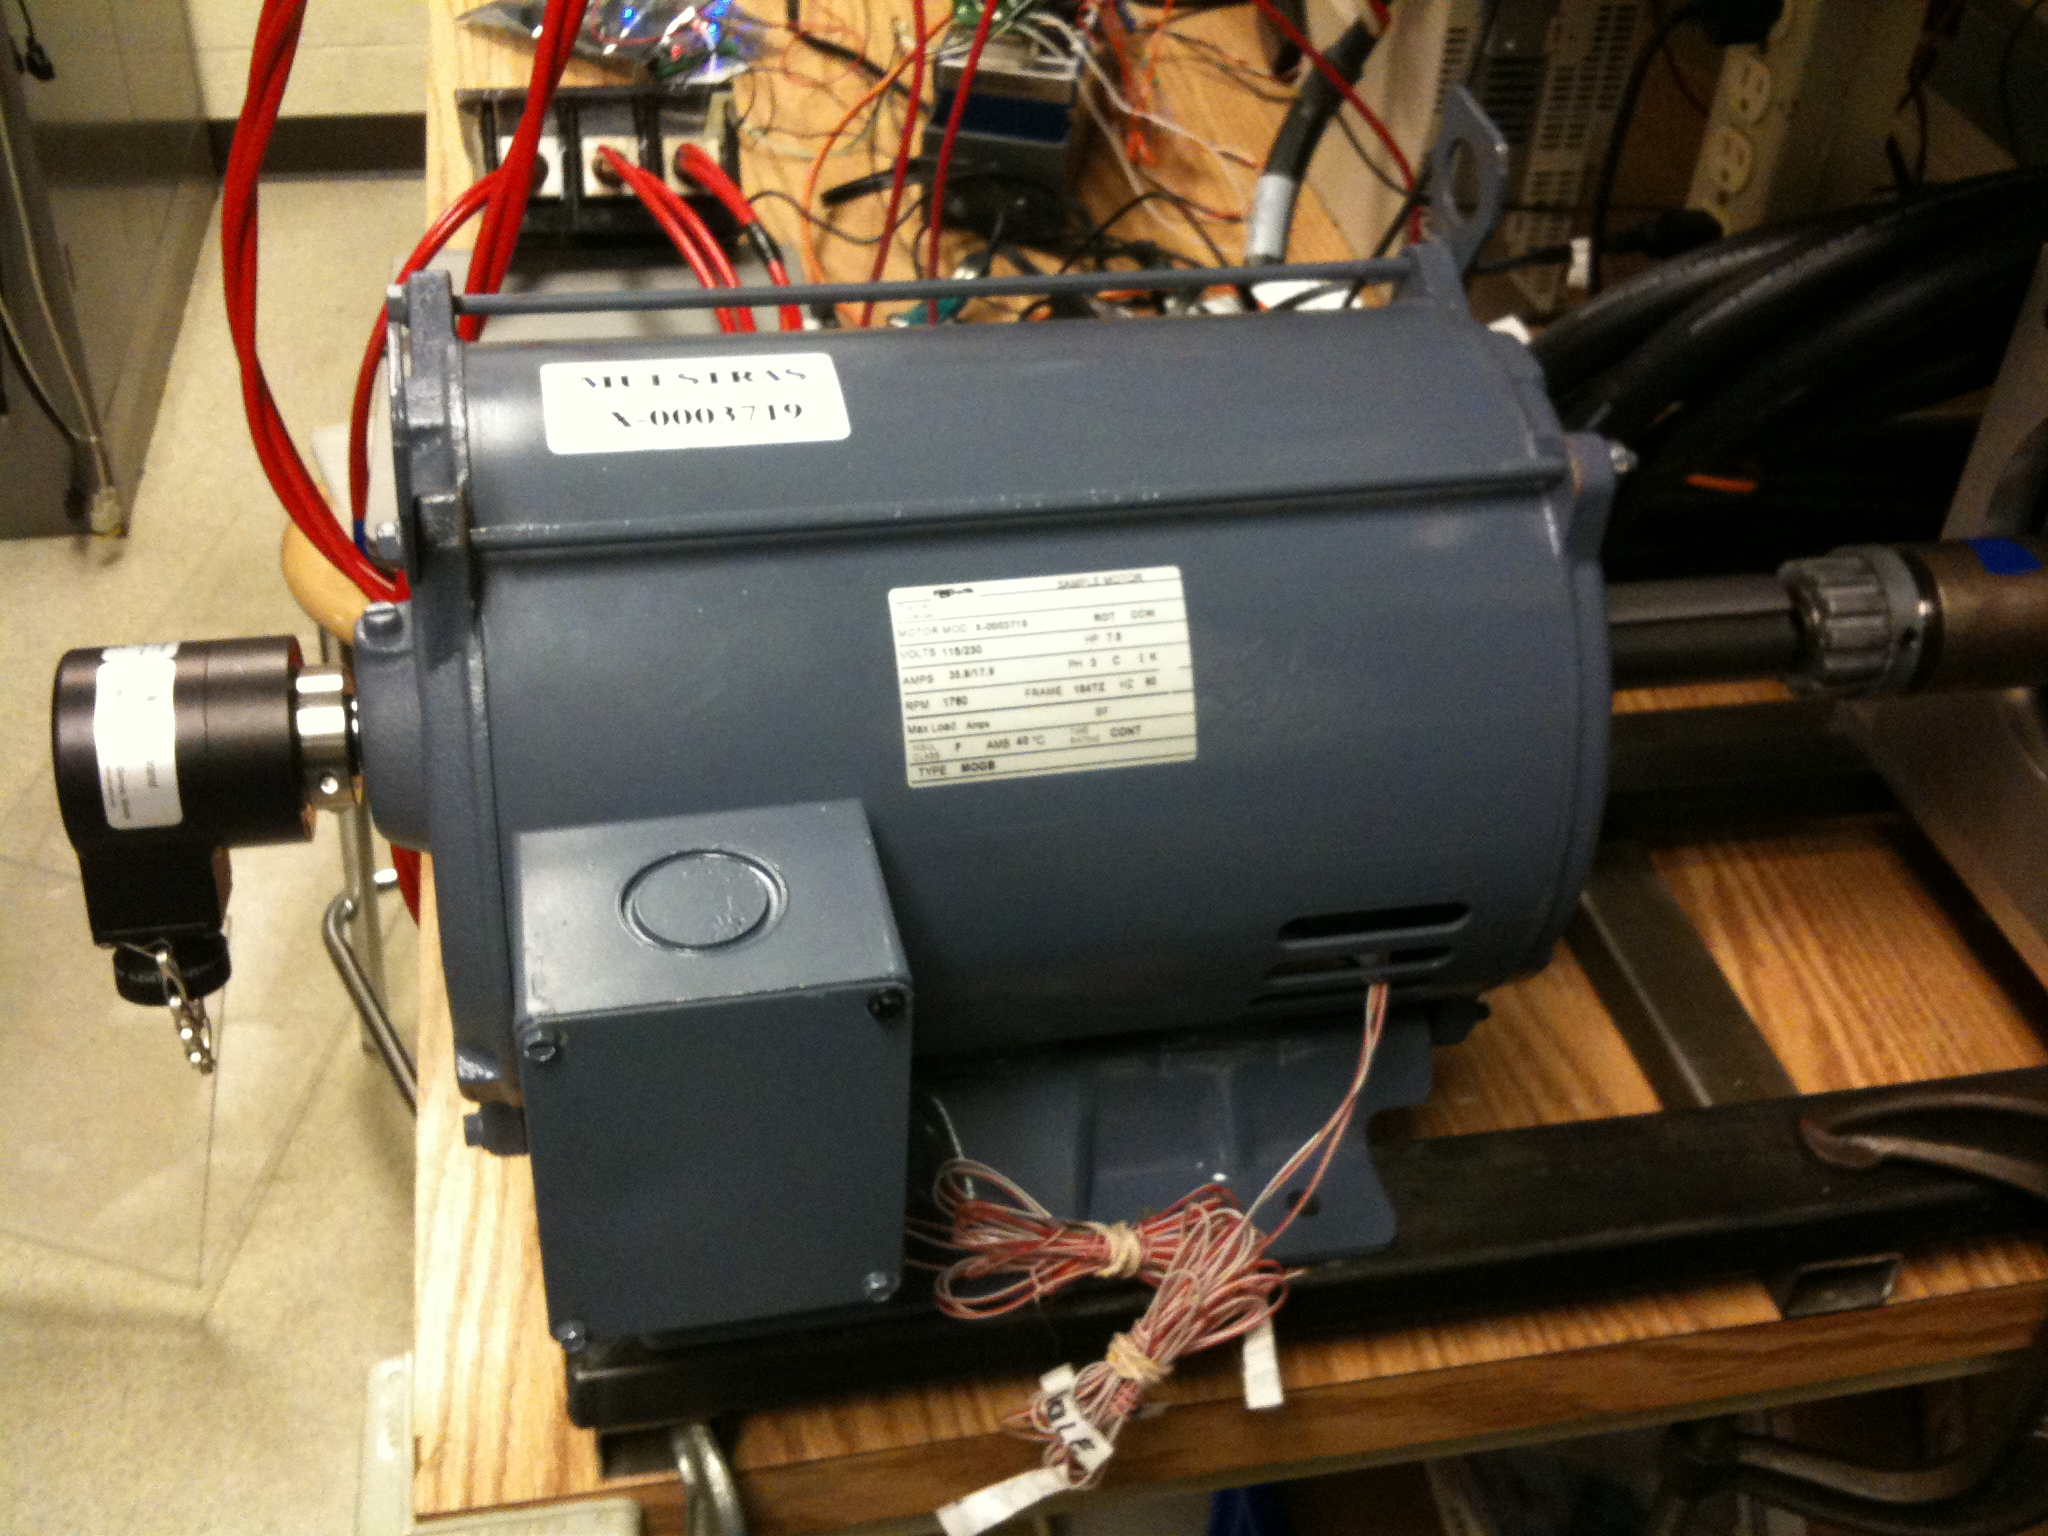 A.O. Smith drive motor